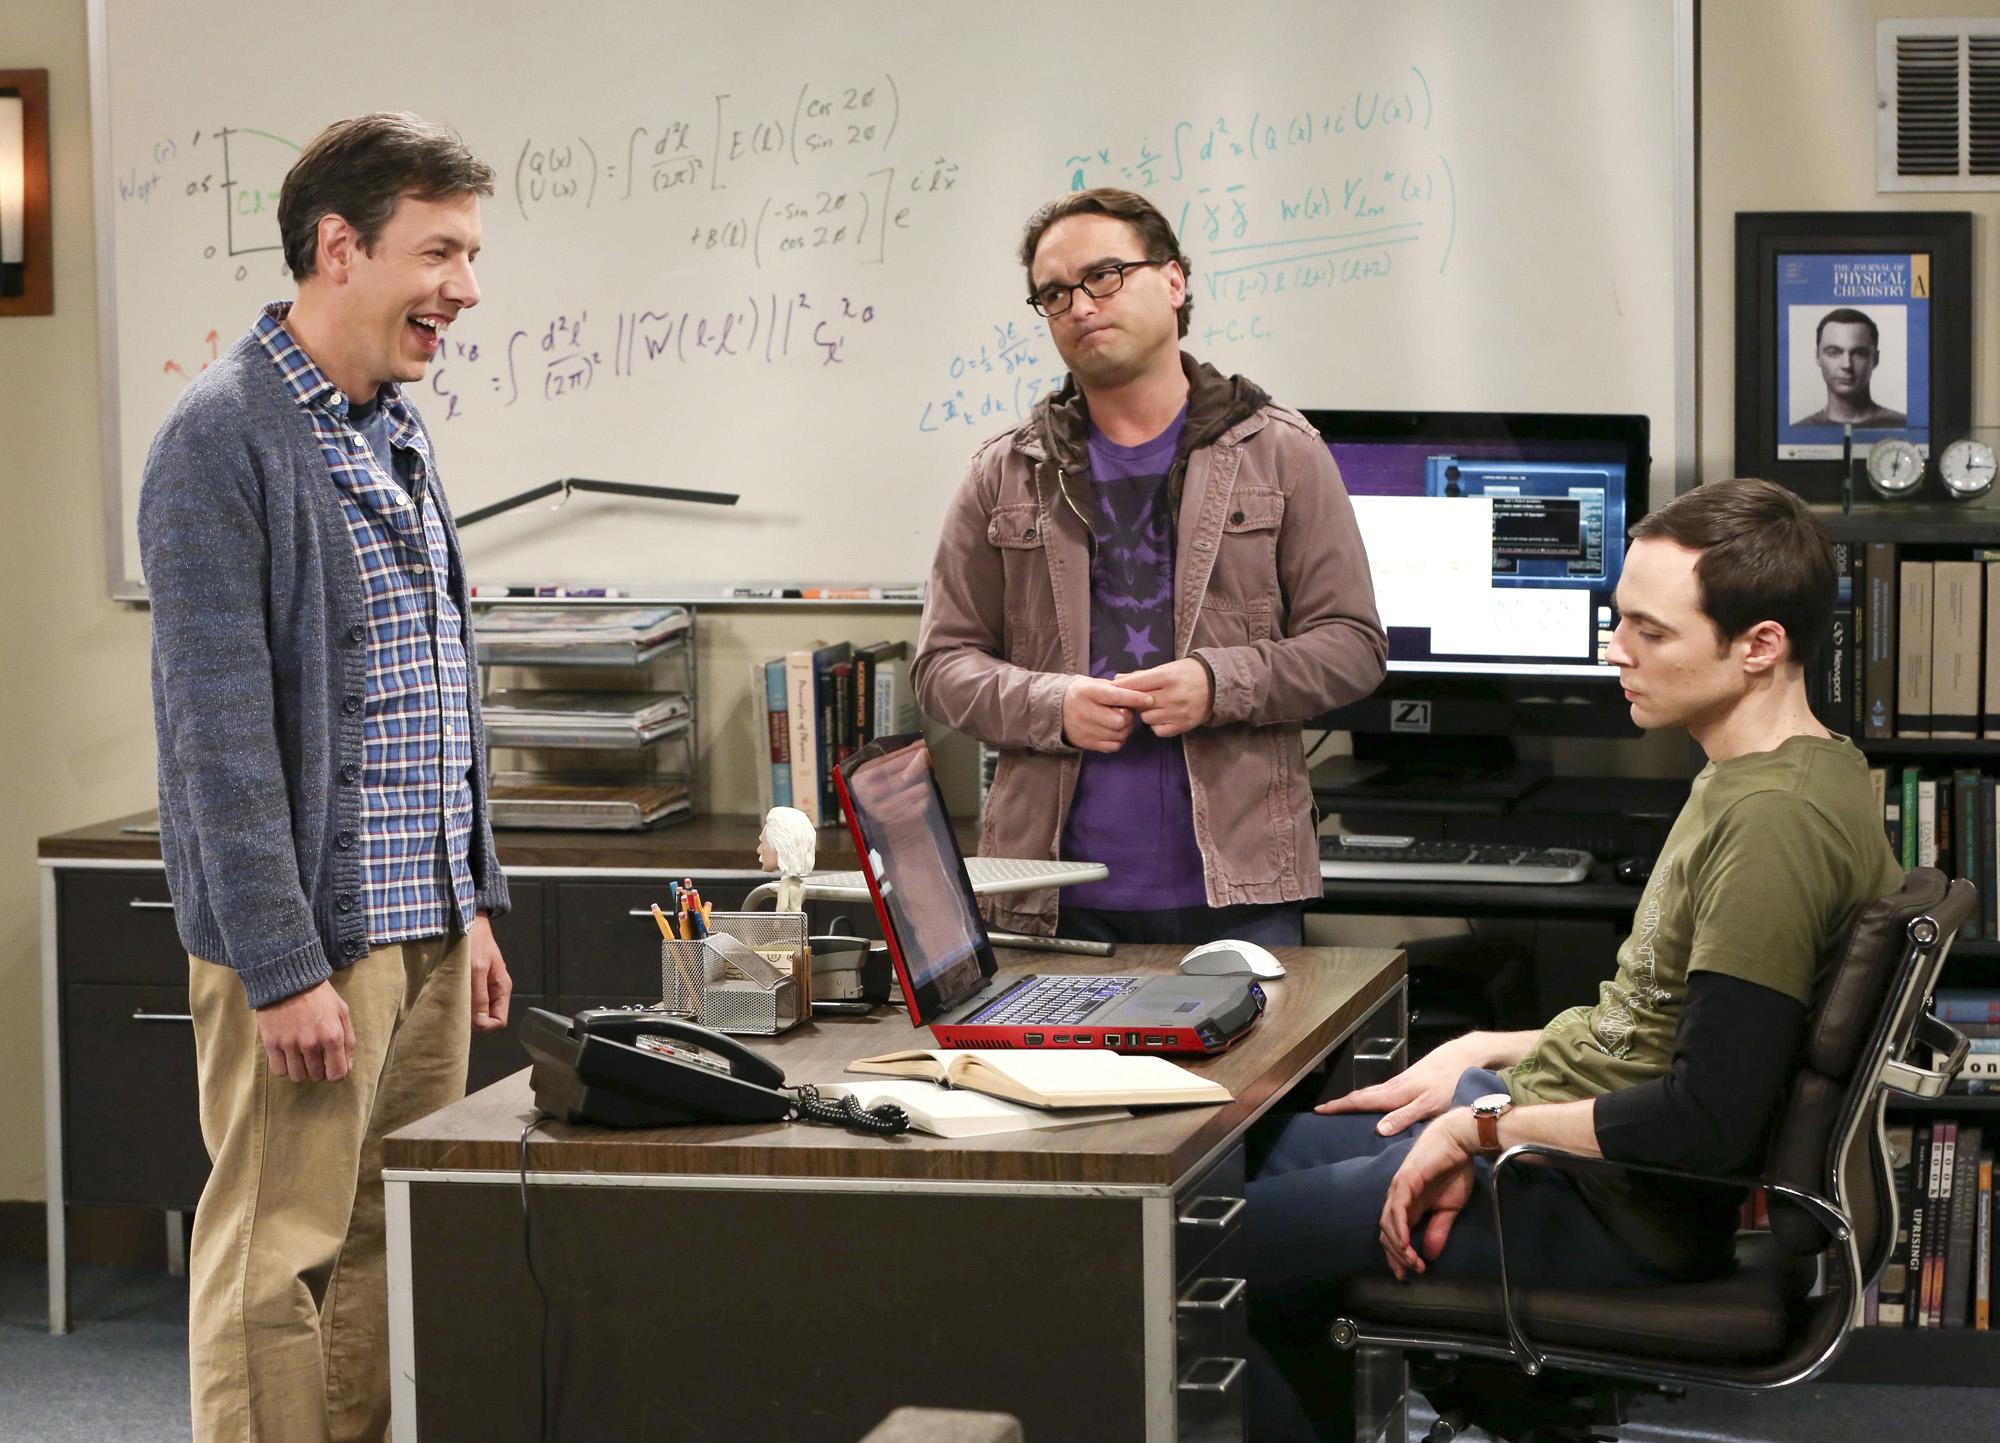 Leonard and Sheldon in